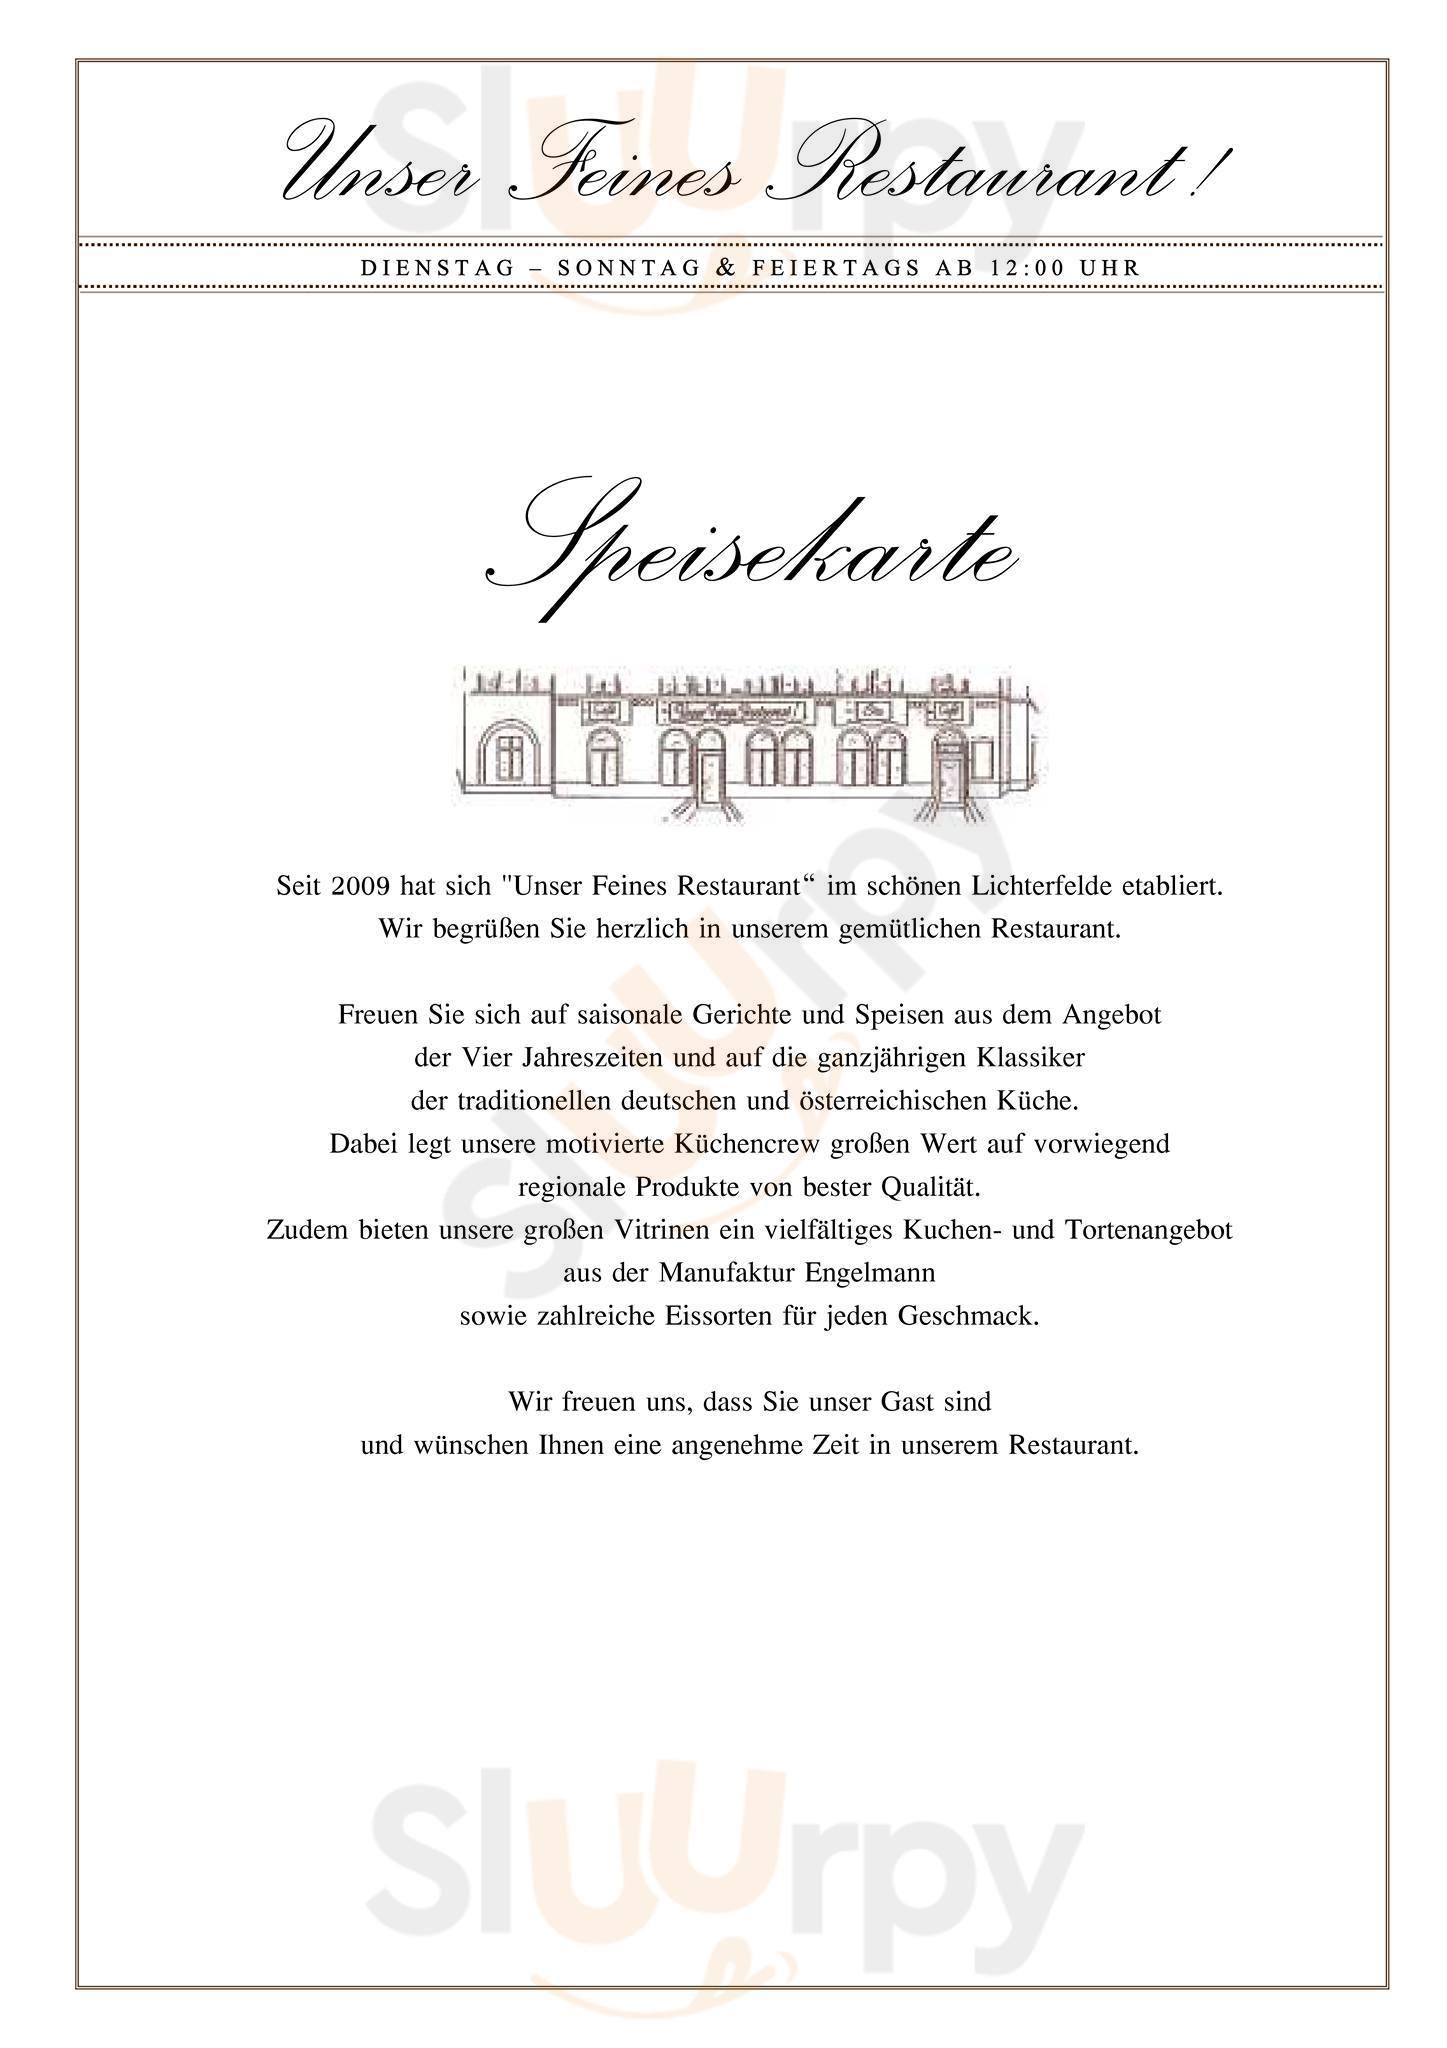 Unser Feines Restaurant Berlin Menu - 1